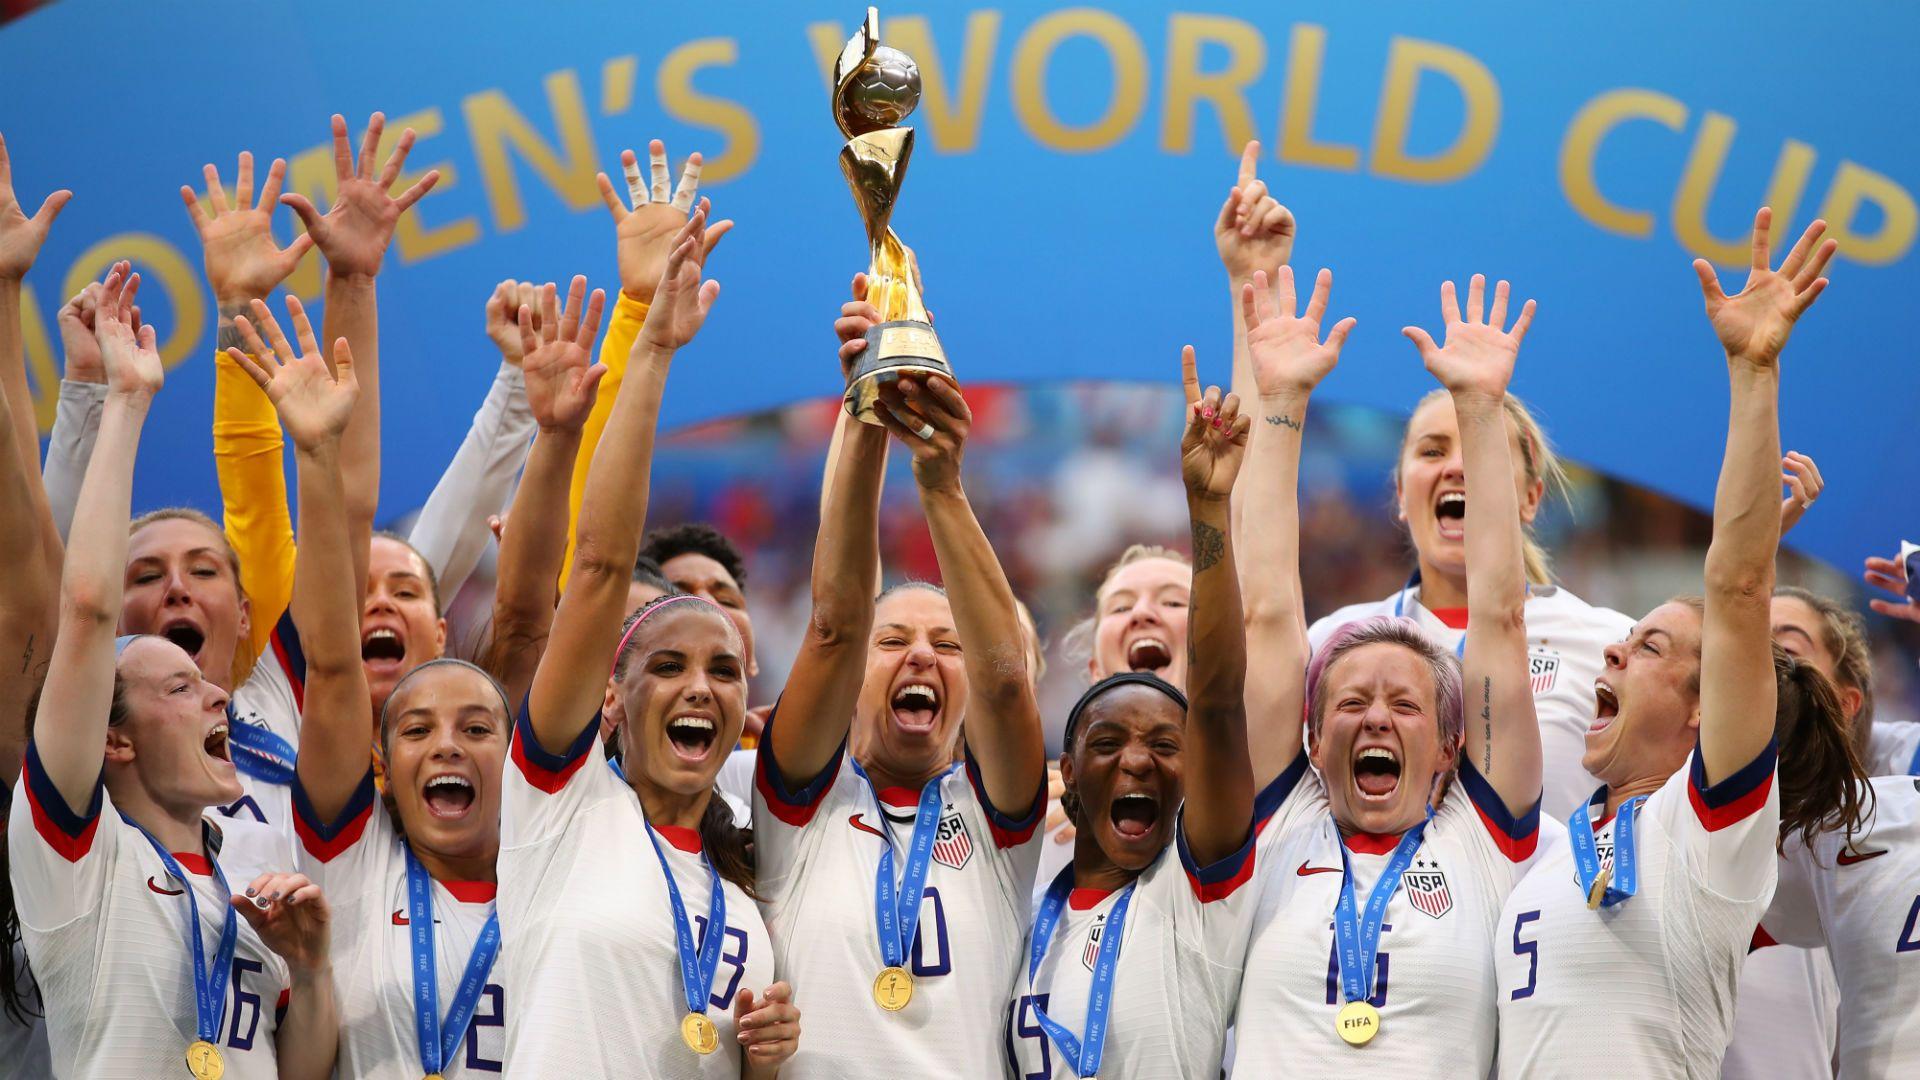 men s team blasts us soccer backs women s equal pay fight